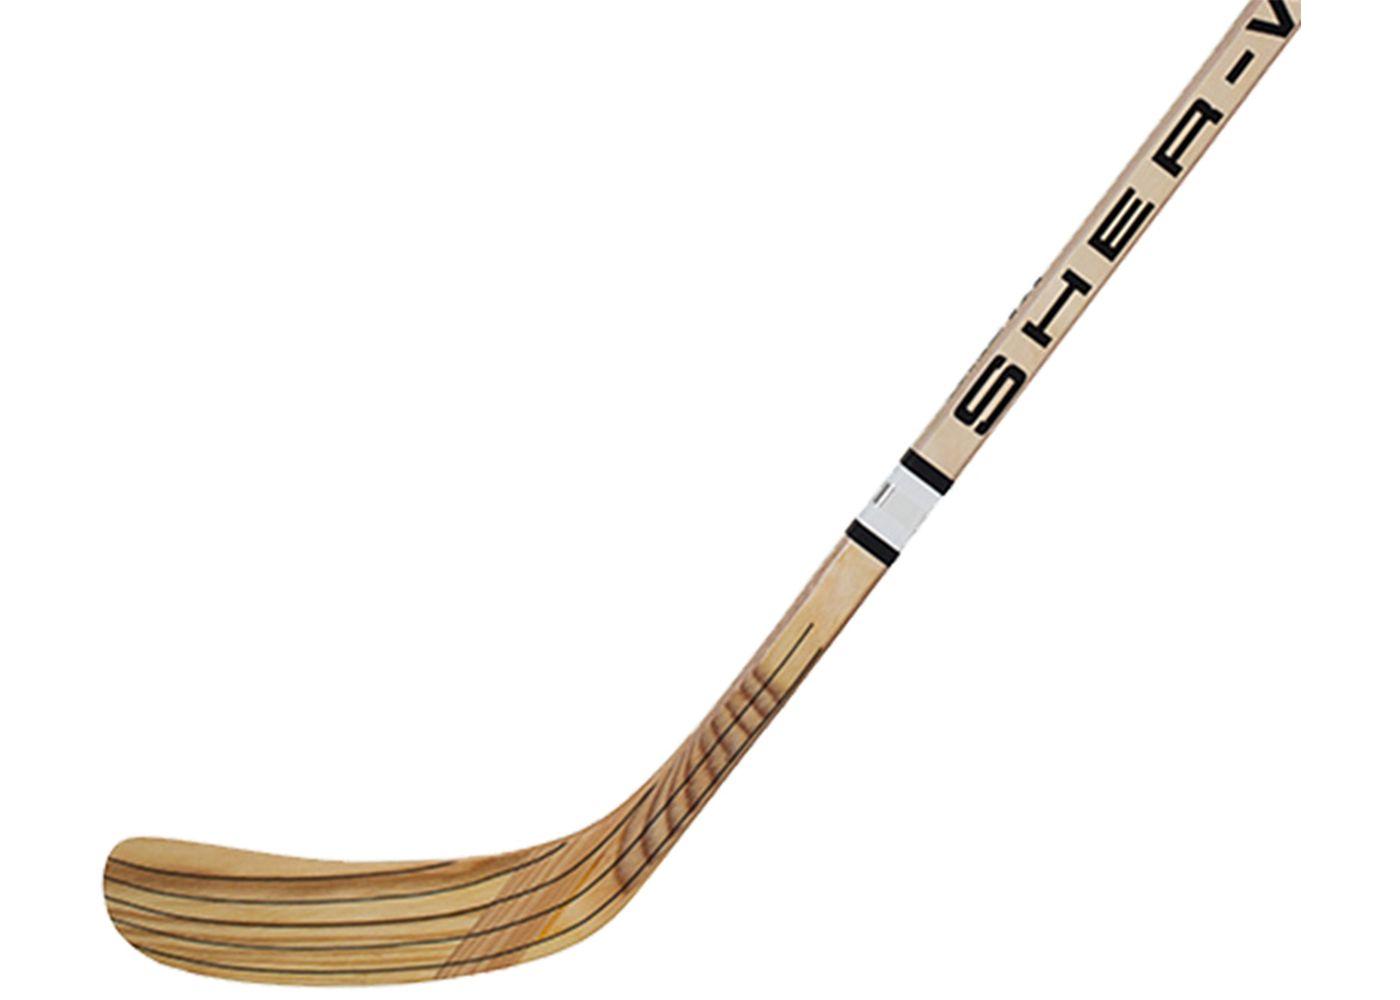 Sher-Wood Junior 5030 Heritage Wood Ice Hockey Stick